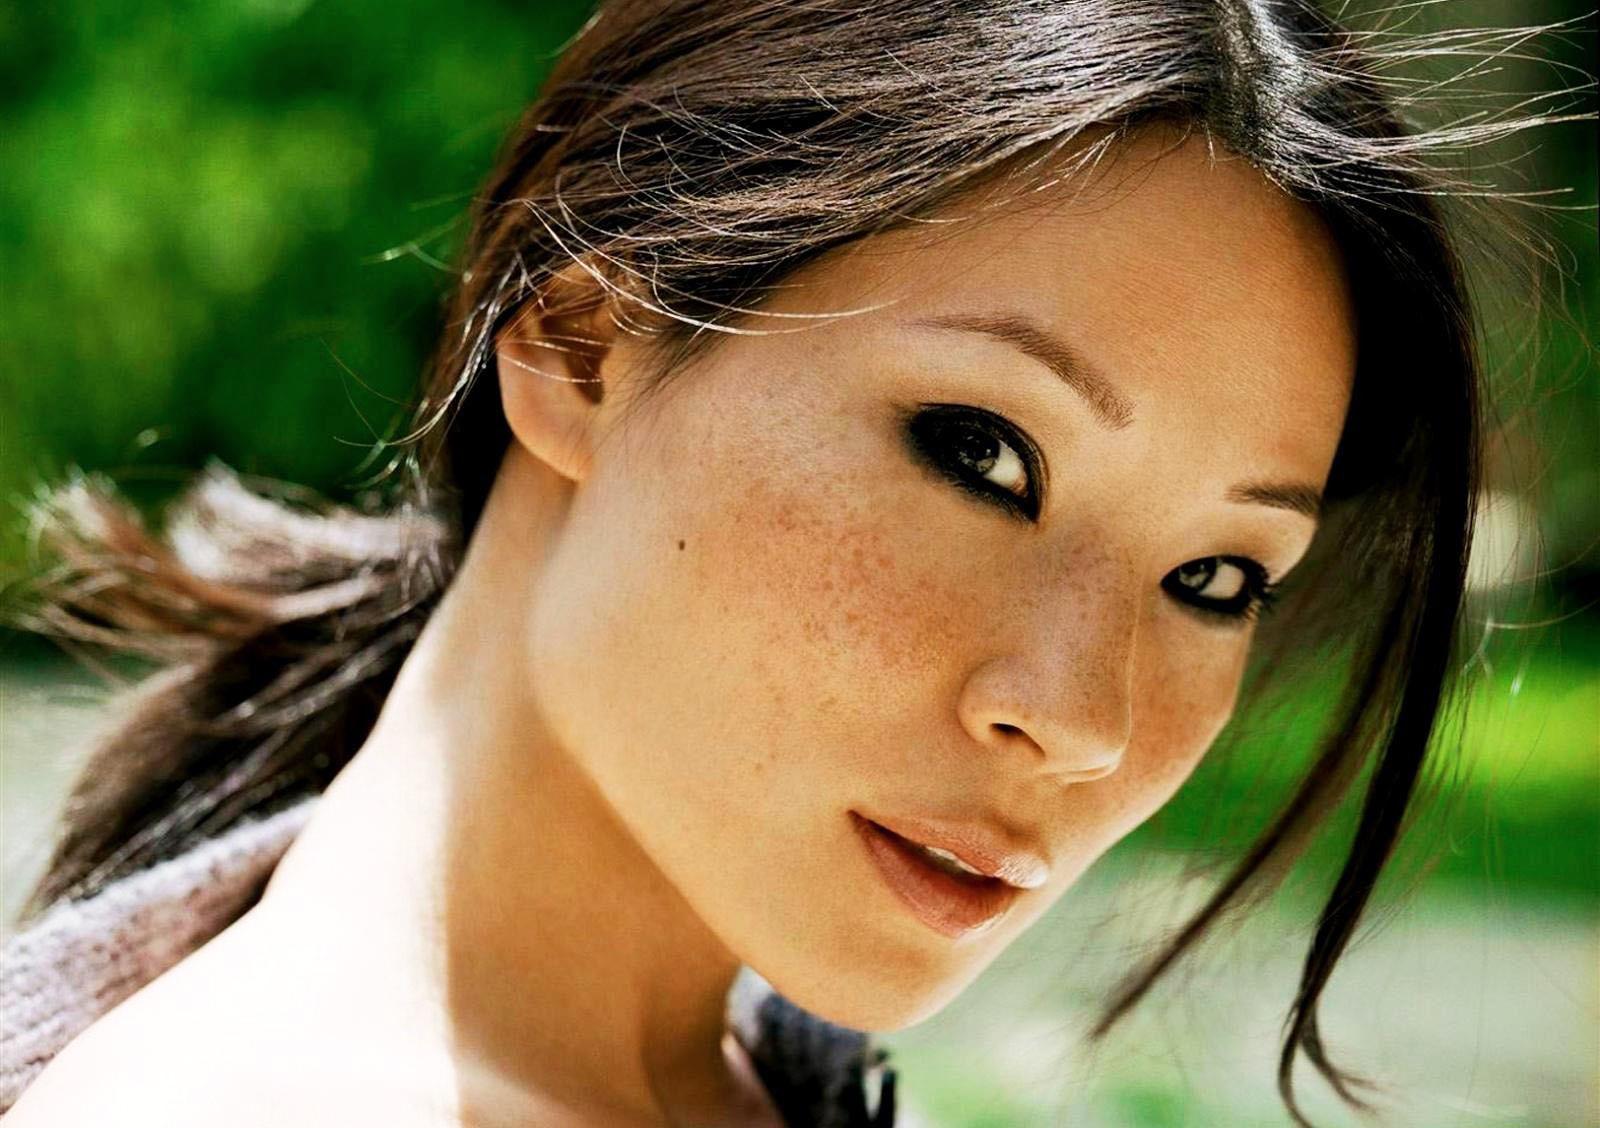 http://4.bp.blogspot.com/_UrdwnOFJcUA/TPHOrJyIAYI/AAAAAAAACHc/7qgPjOFeFQ8/s1600/Lucy%2BLiu.jpg